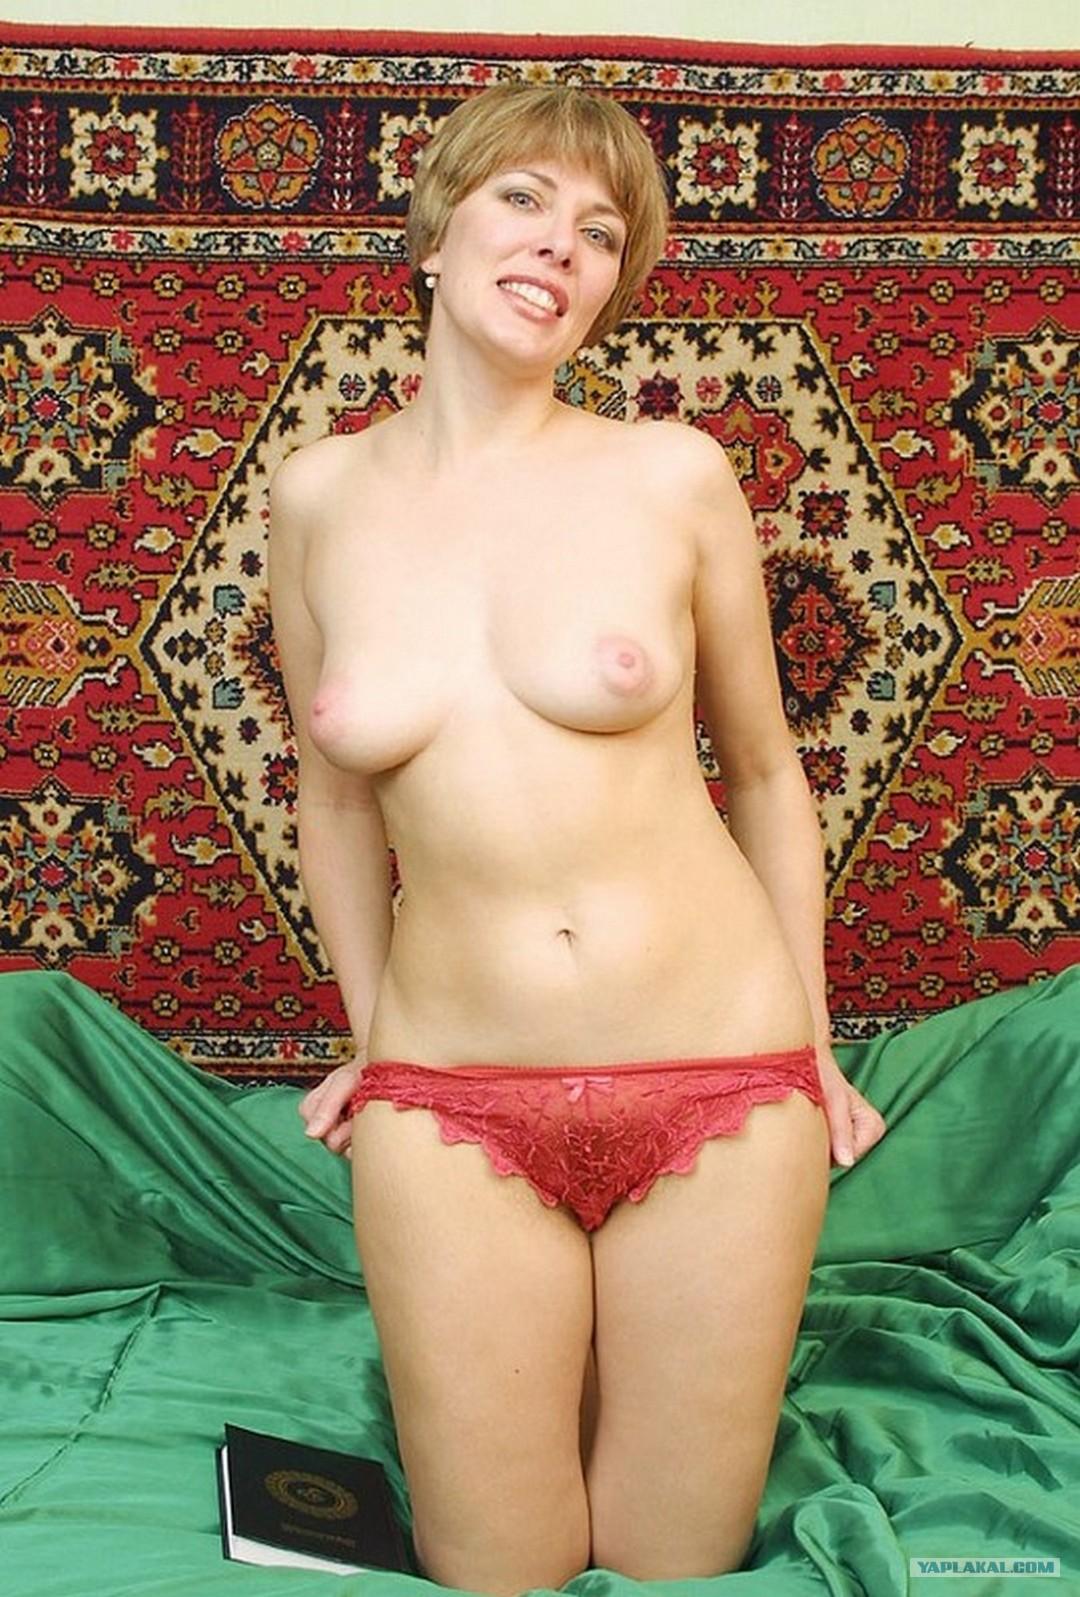 golie-zrelie-dami-russkie-foto